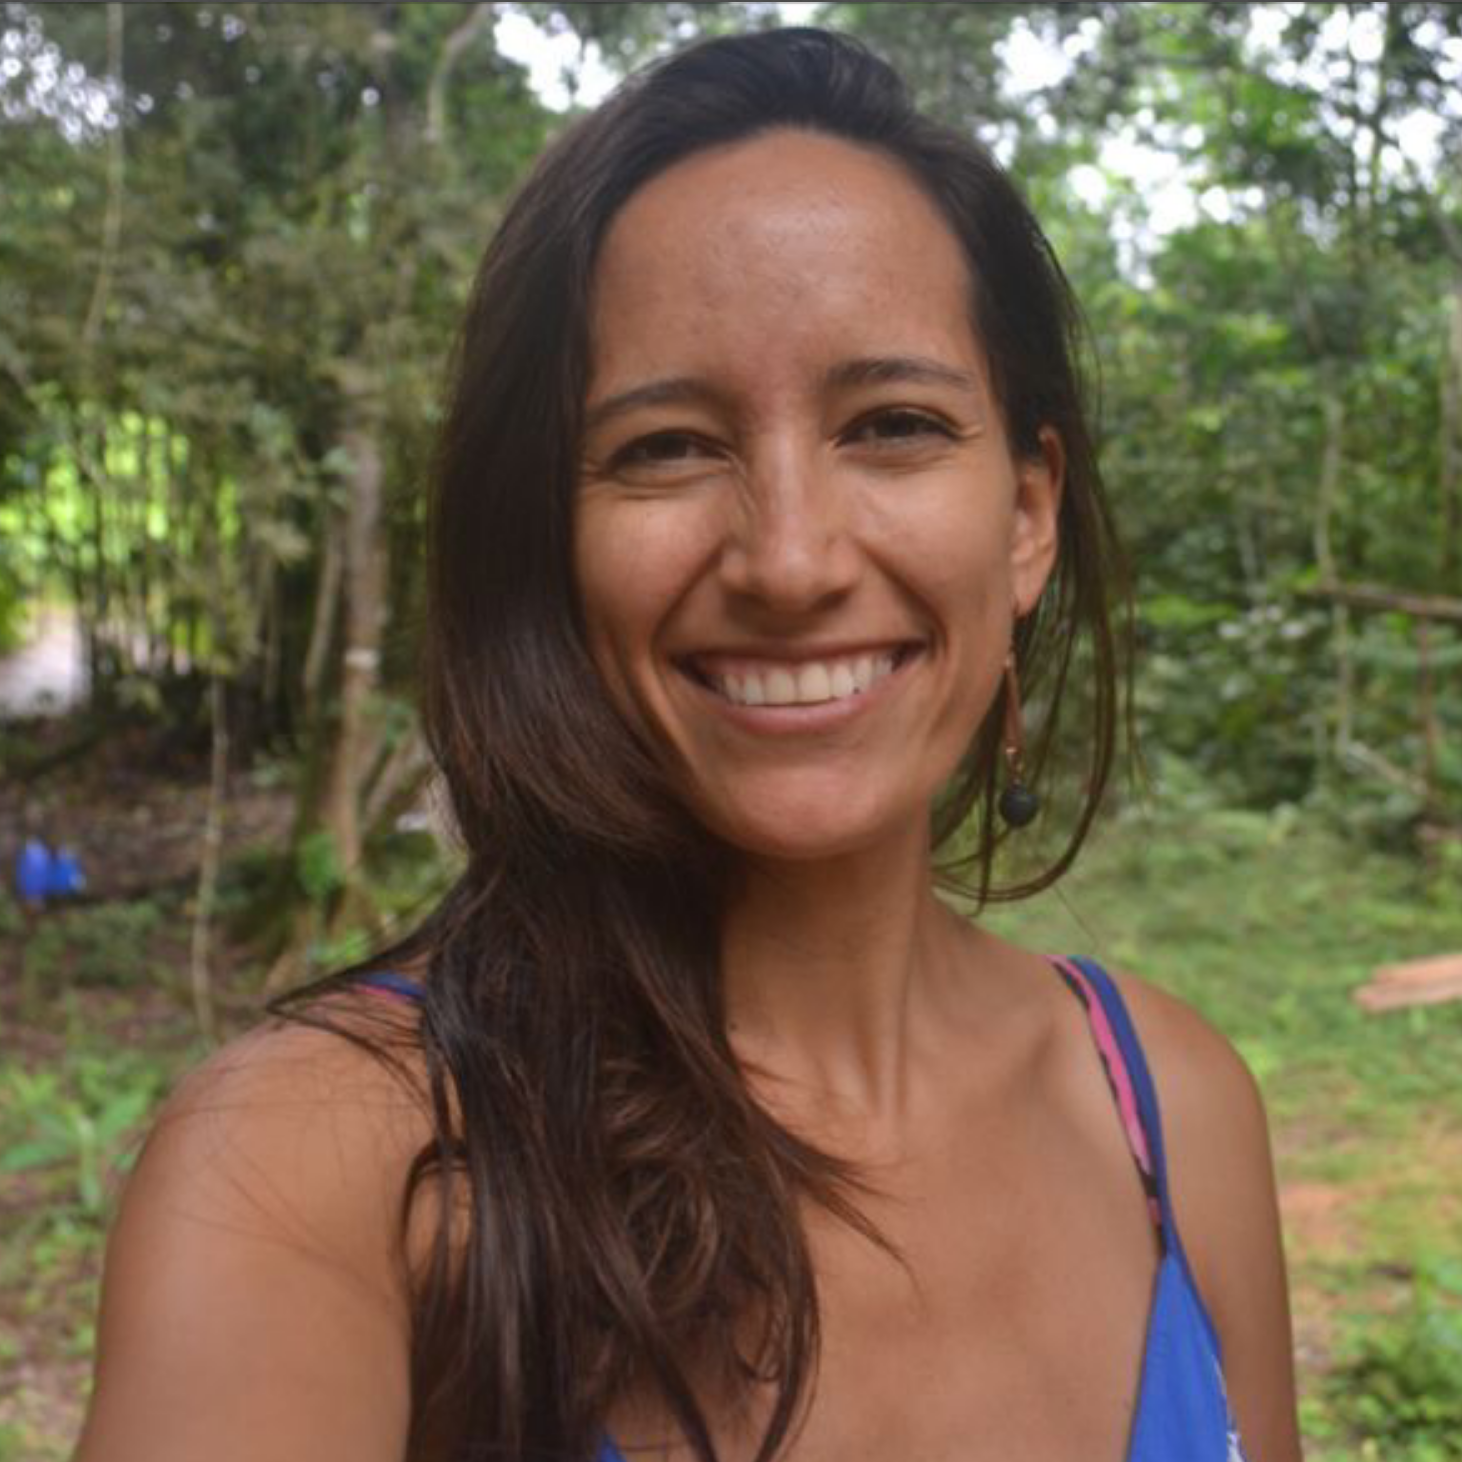 Karina Bautista